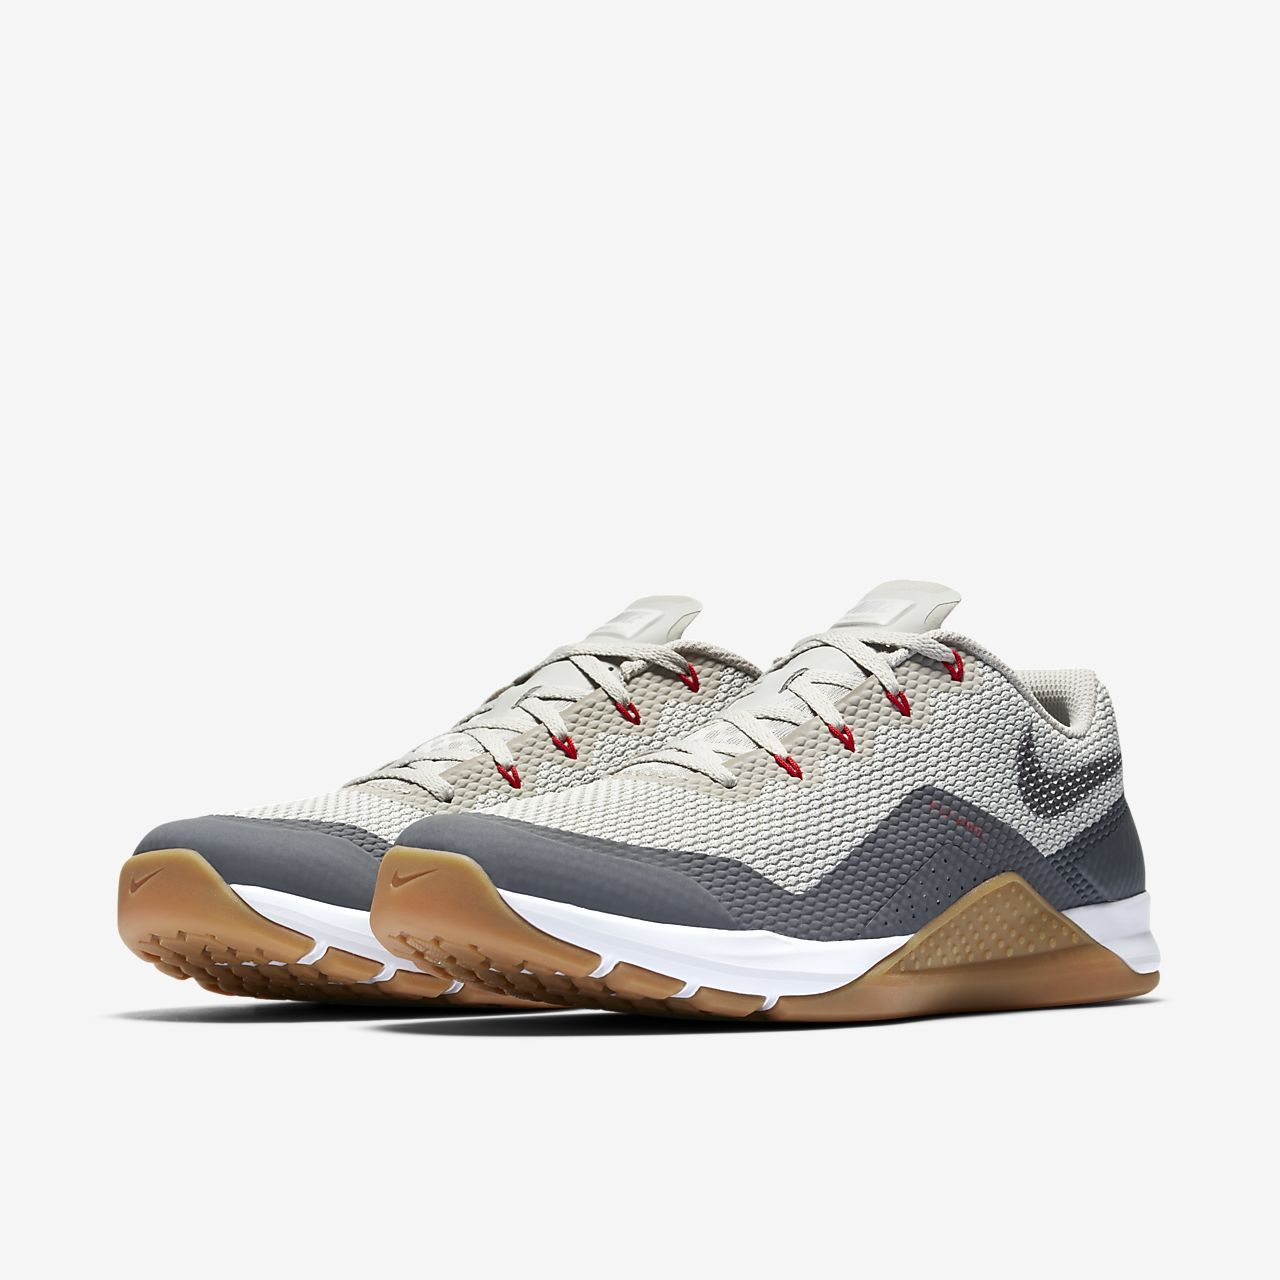 9ae10388e20 Nike Metcon Repper DSX Men s Training Shoe